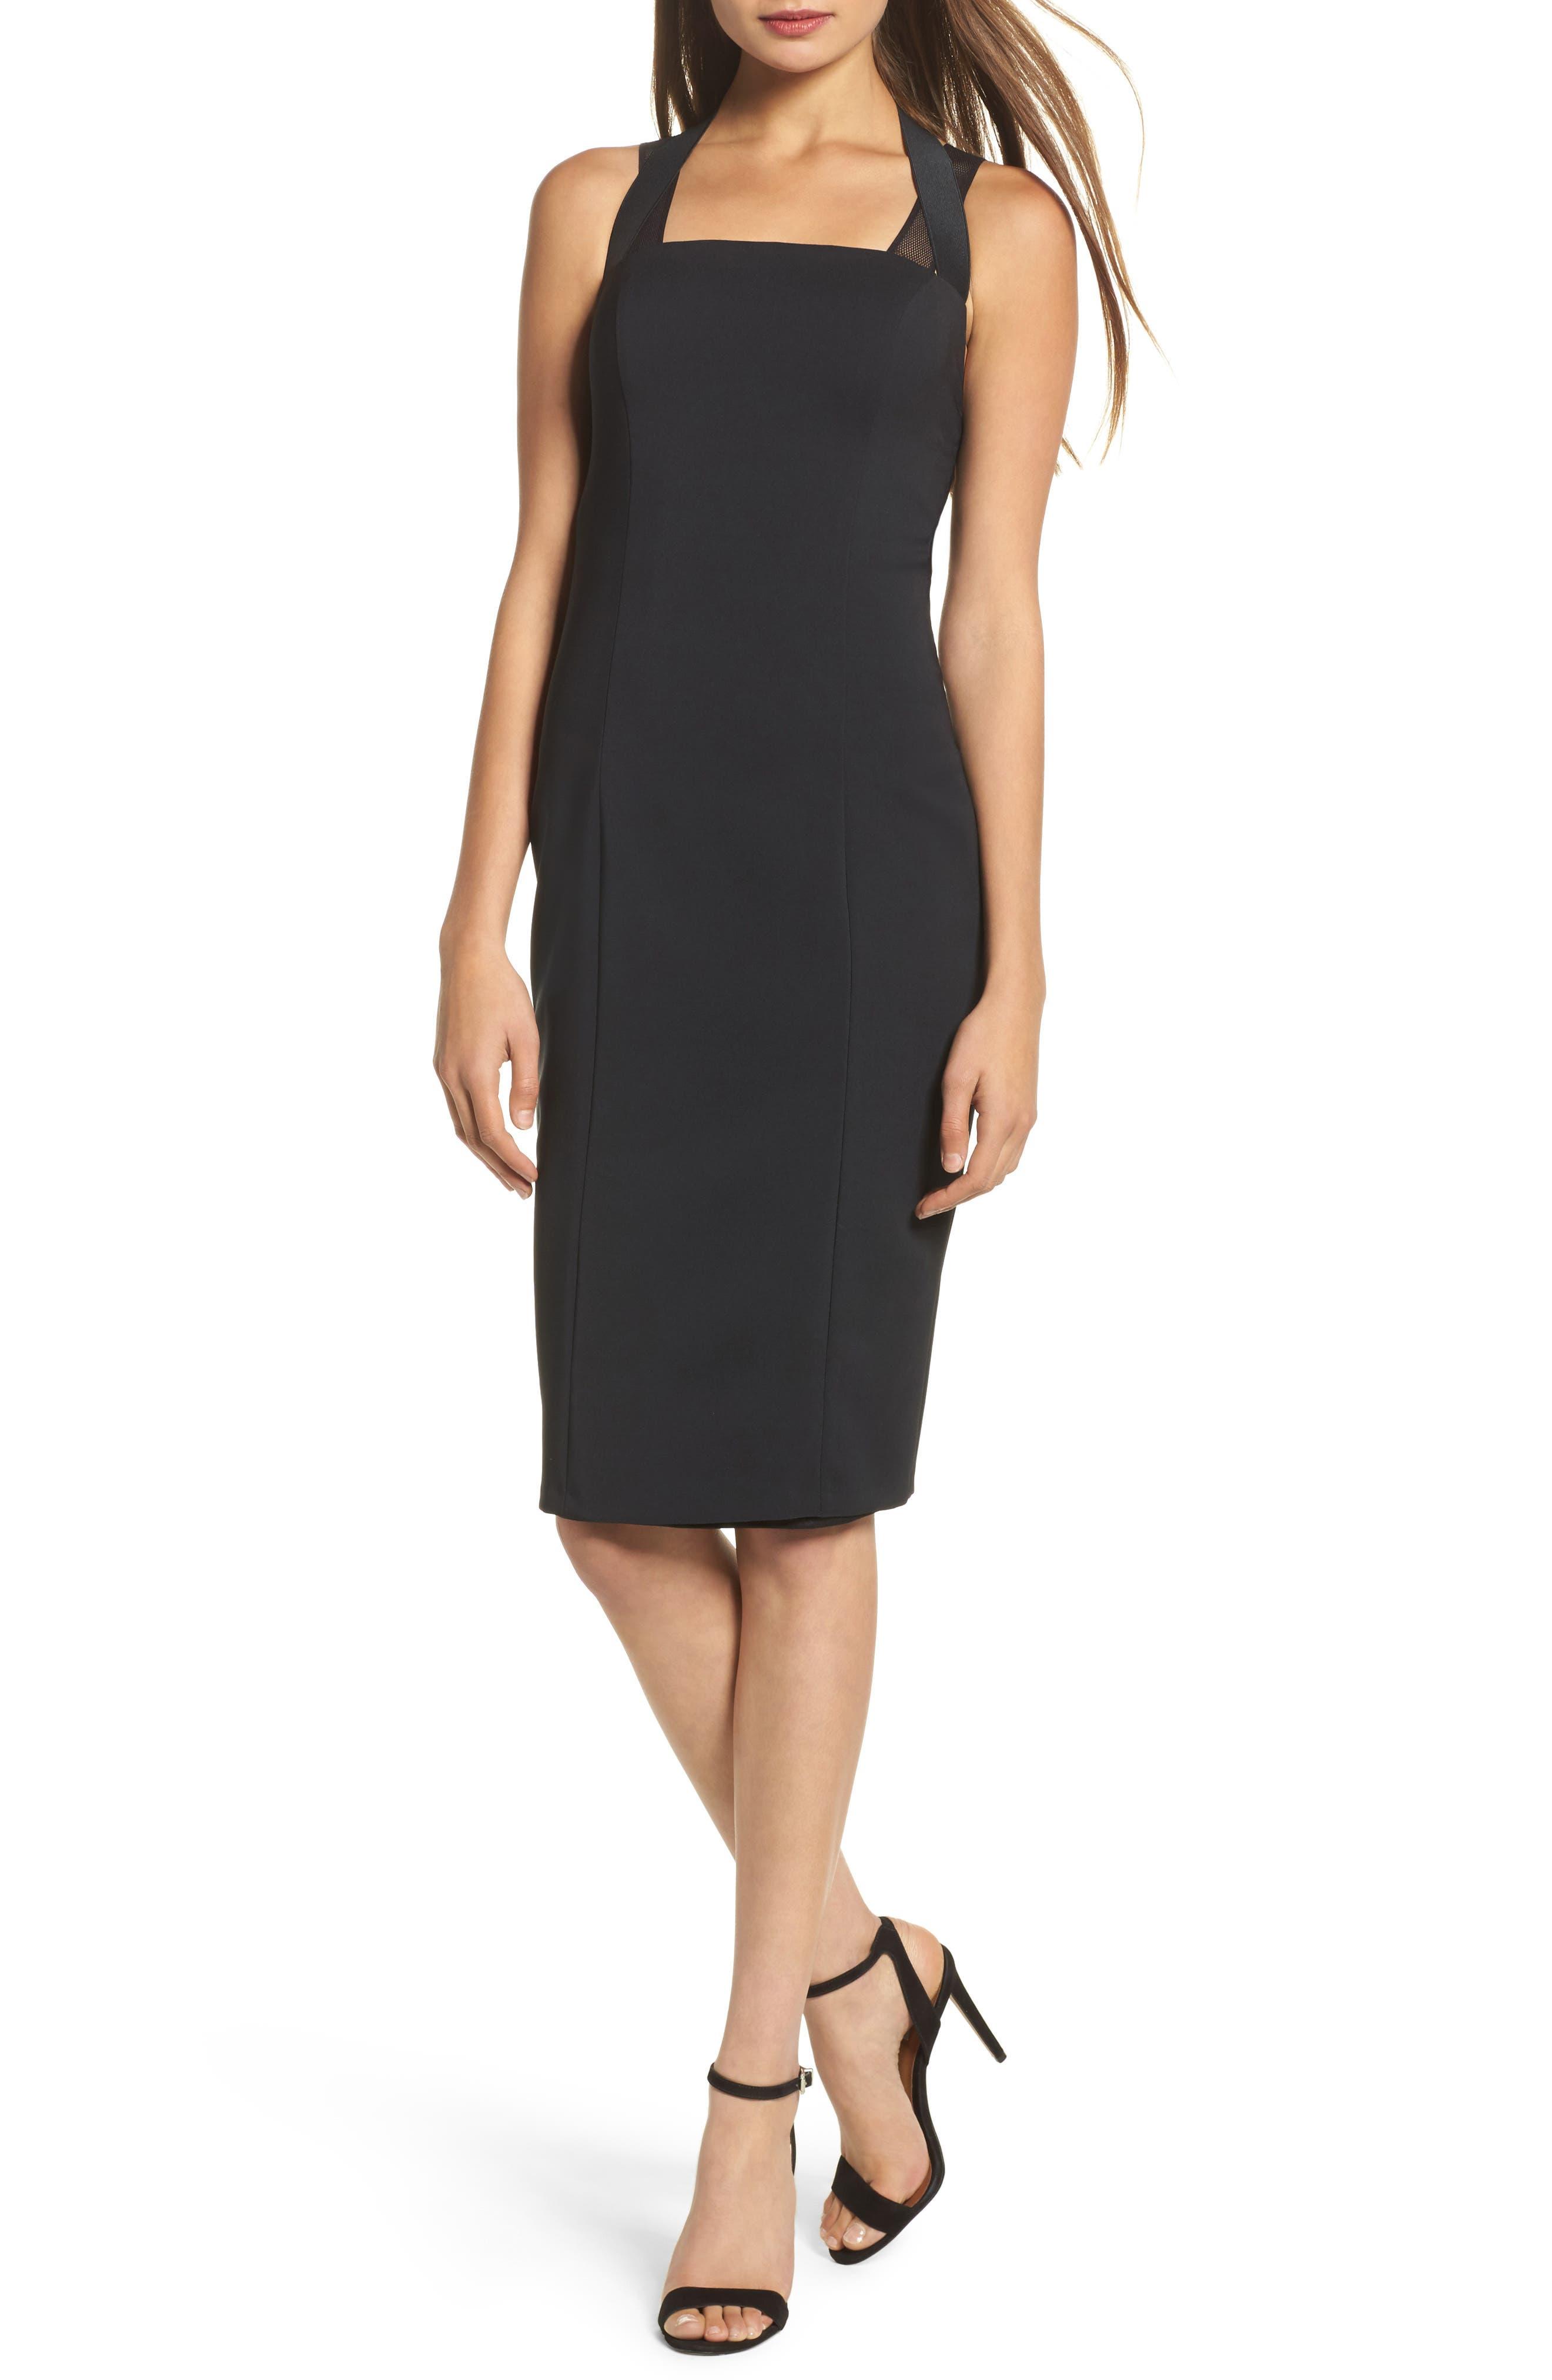 Kendra Elastic Strap Low Back Sheath Dress,                         Main,                         color, Black